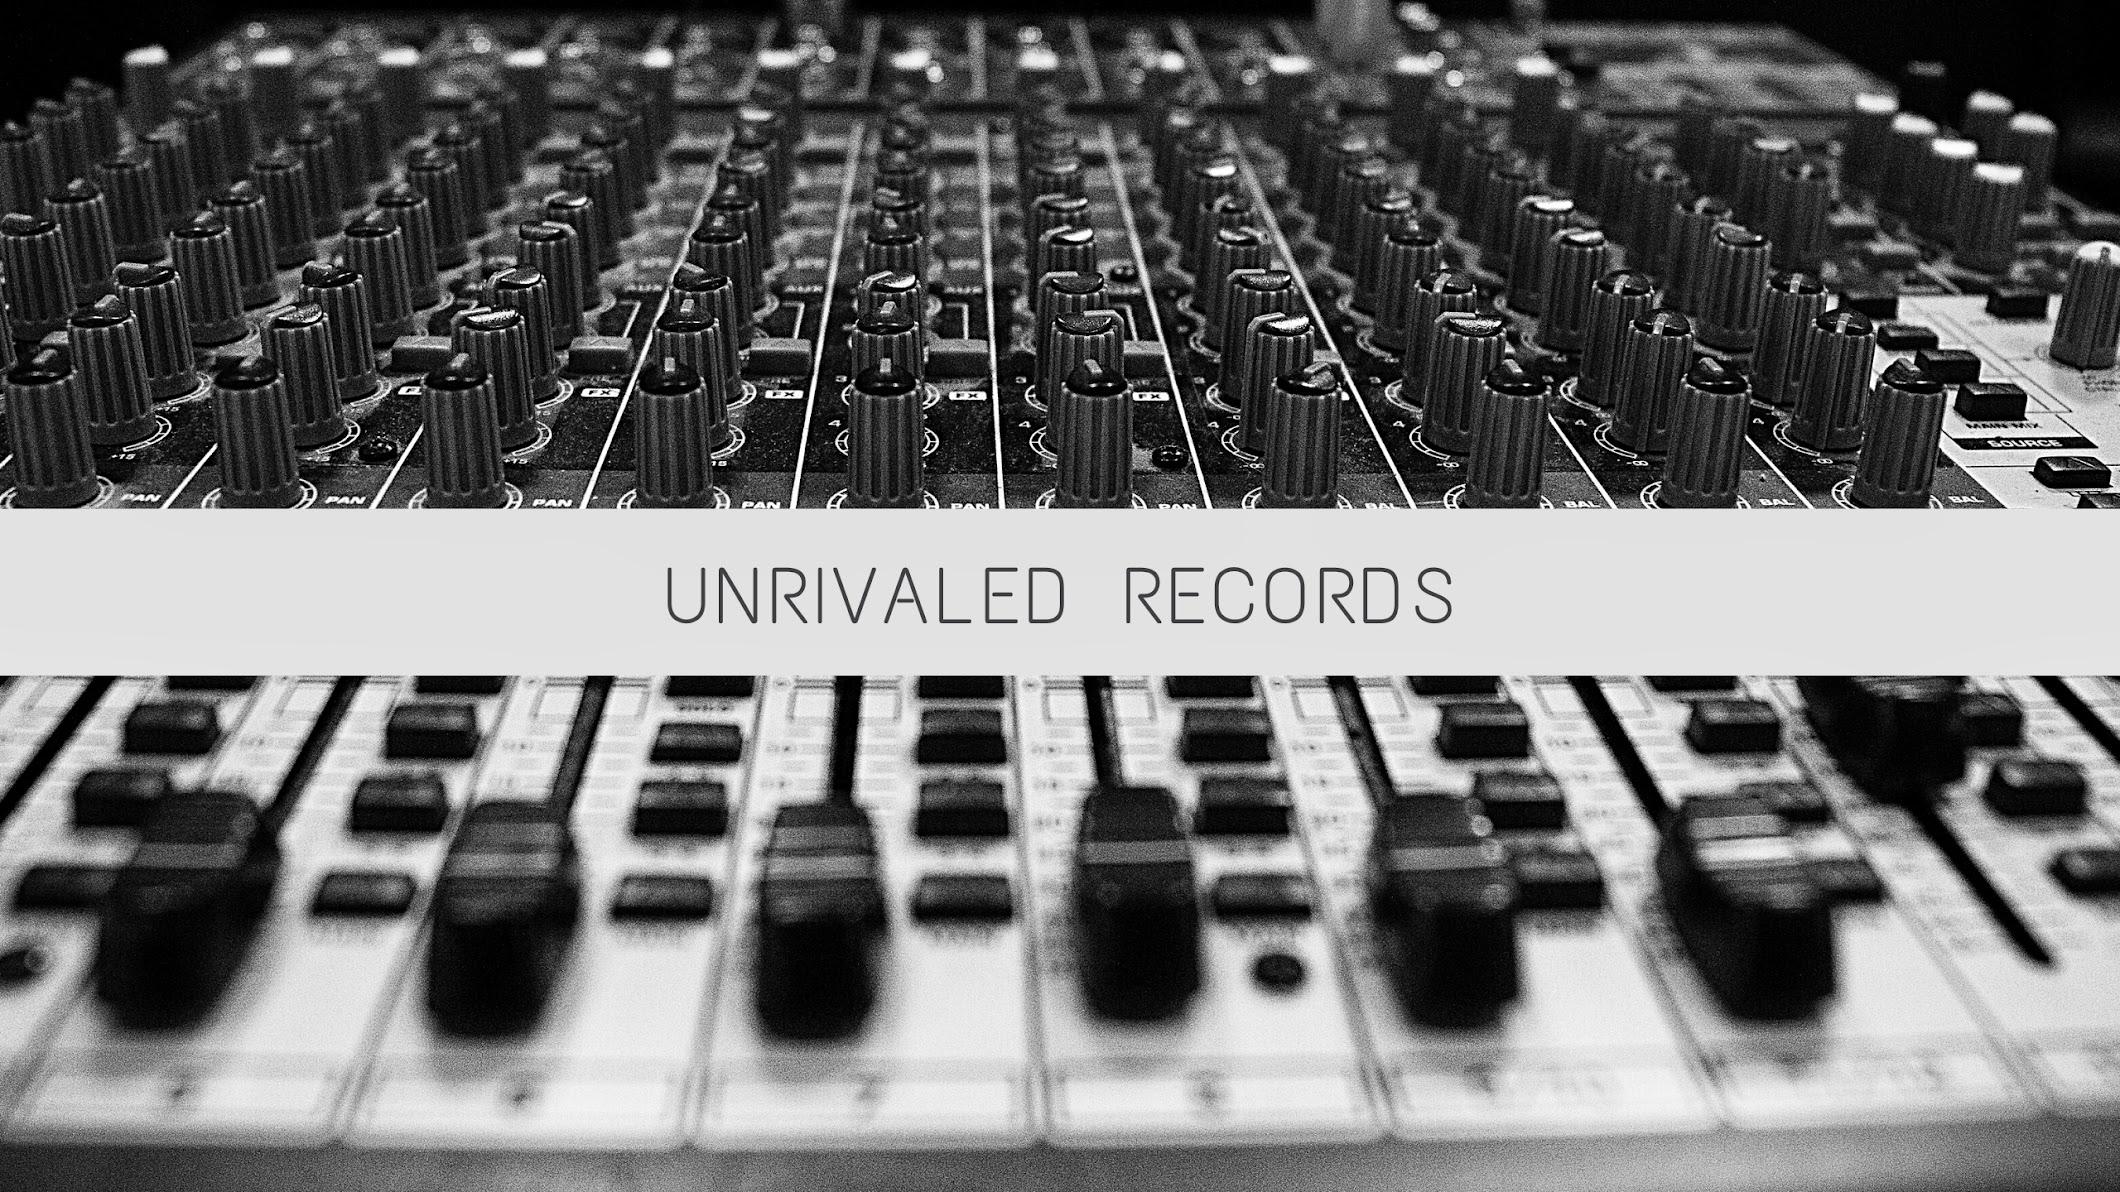 Unrivaled Records